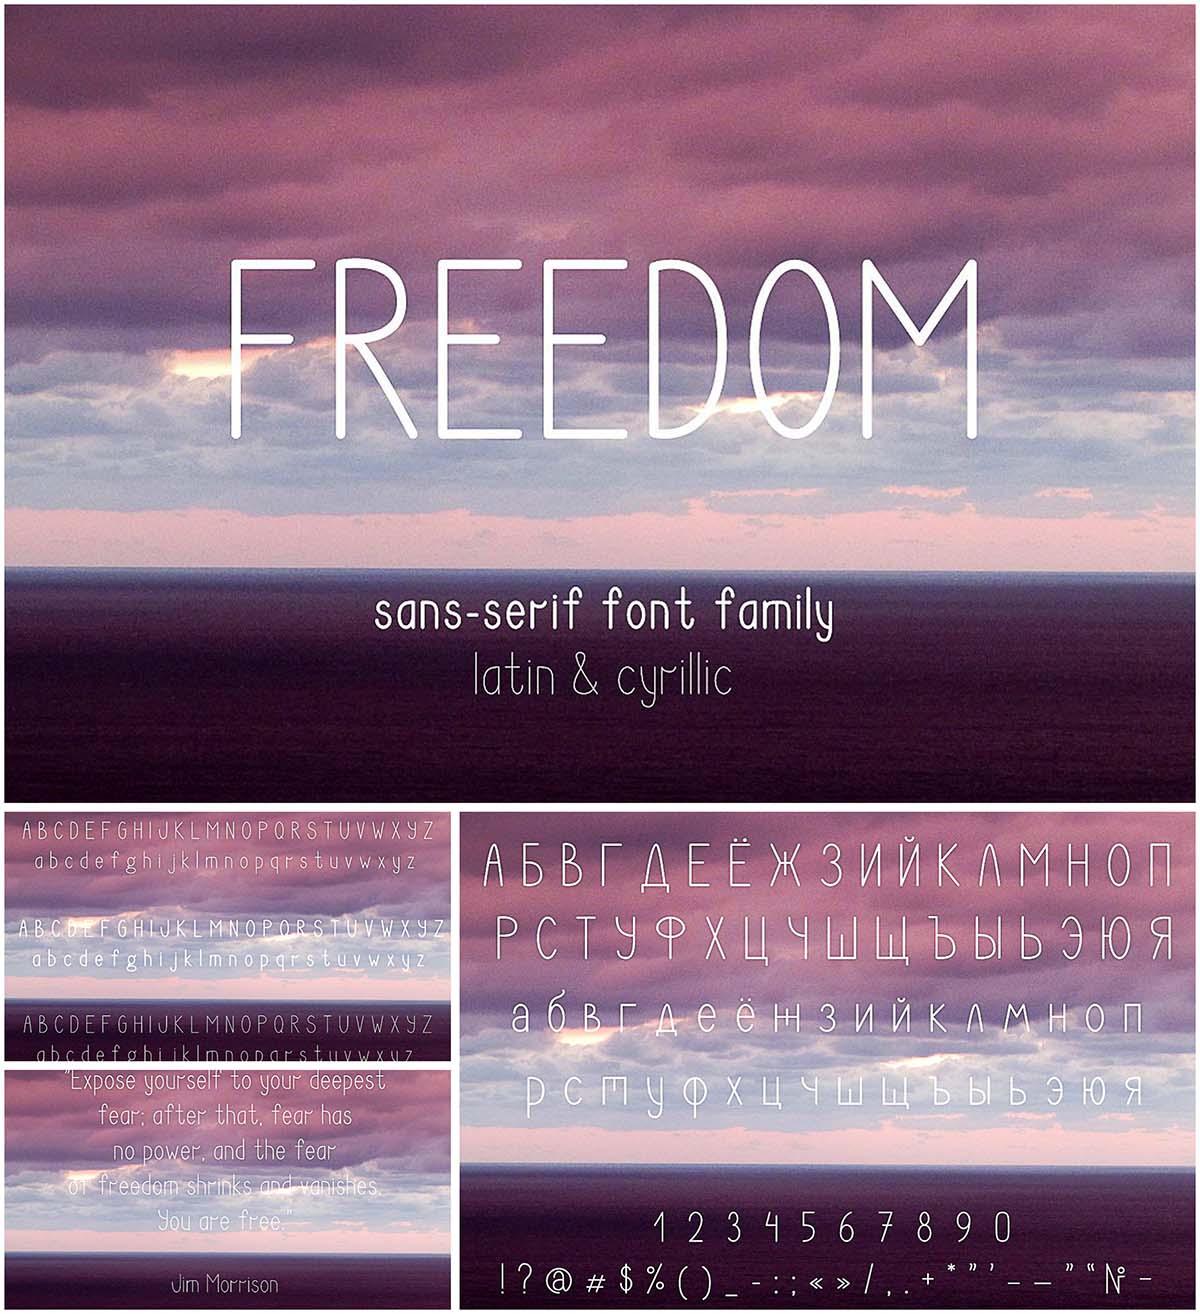 Freedom font family cyrillic